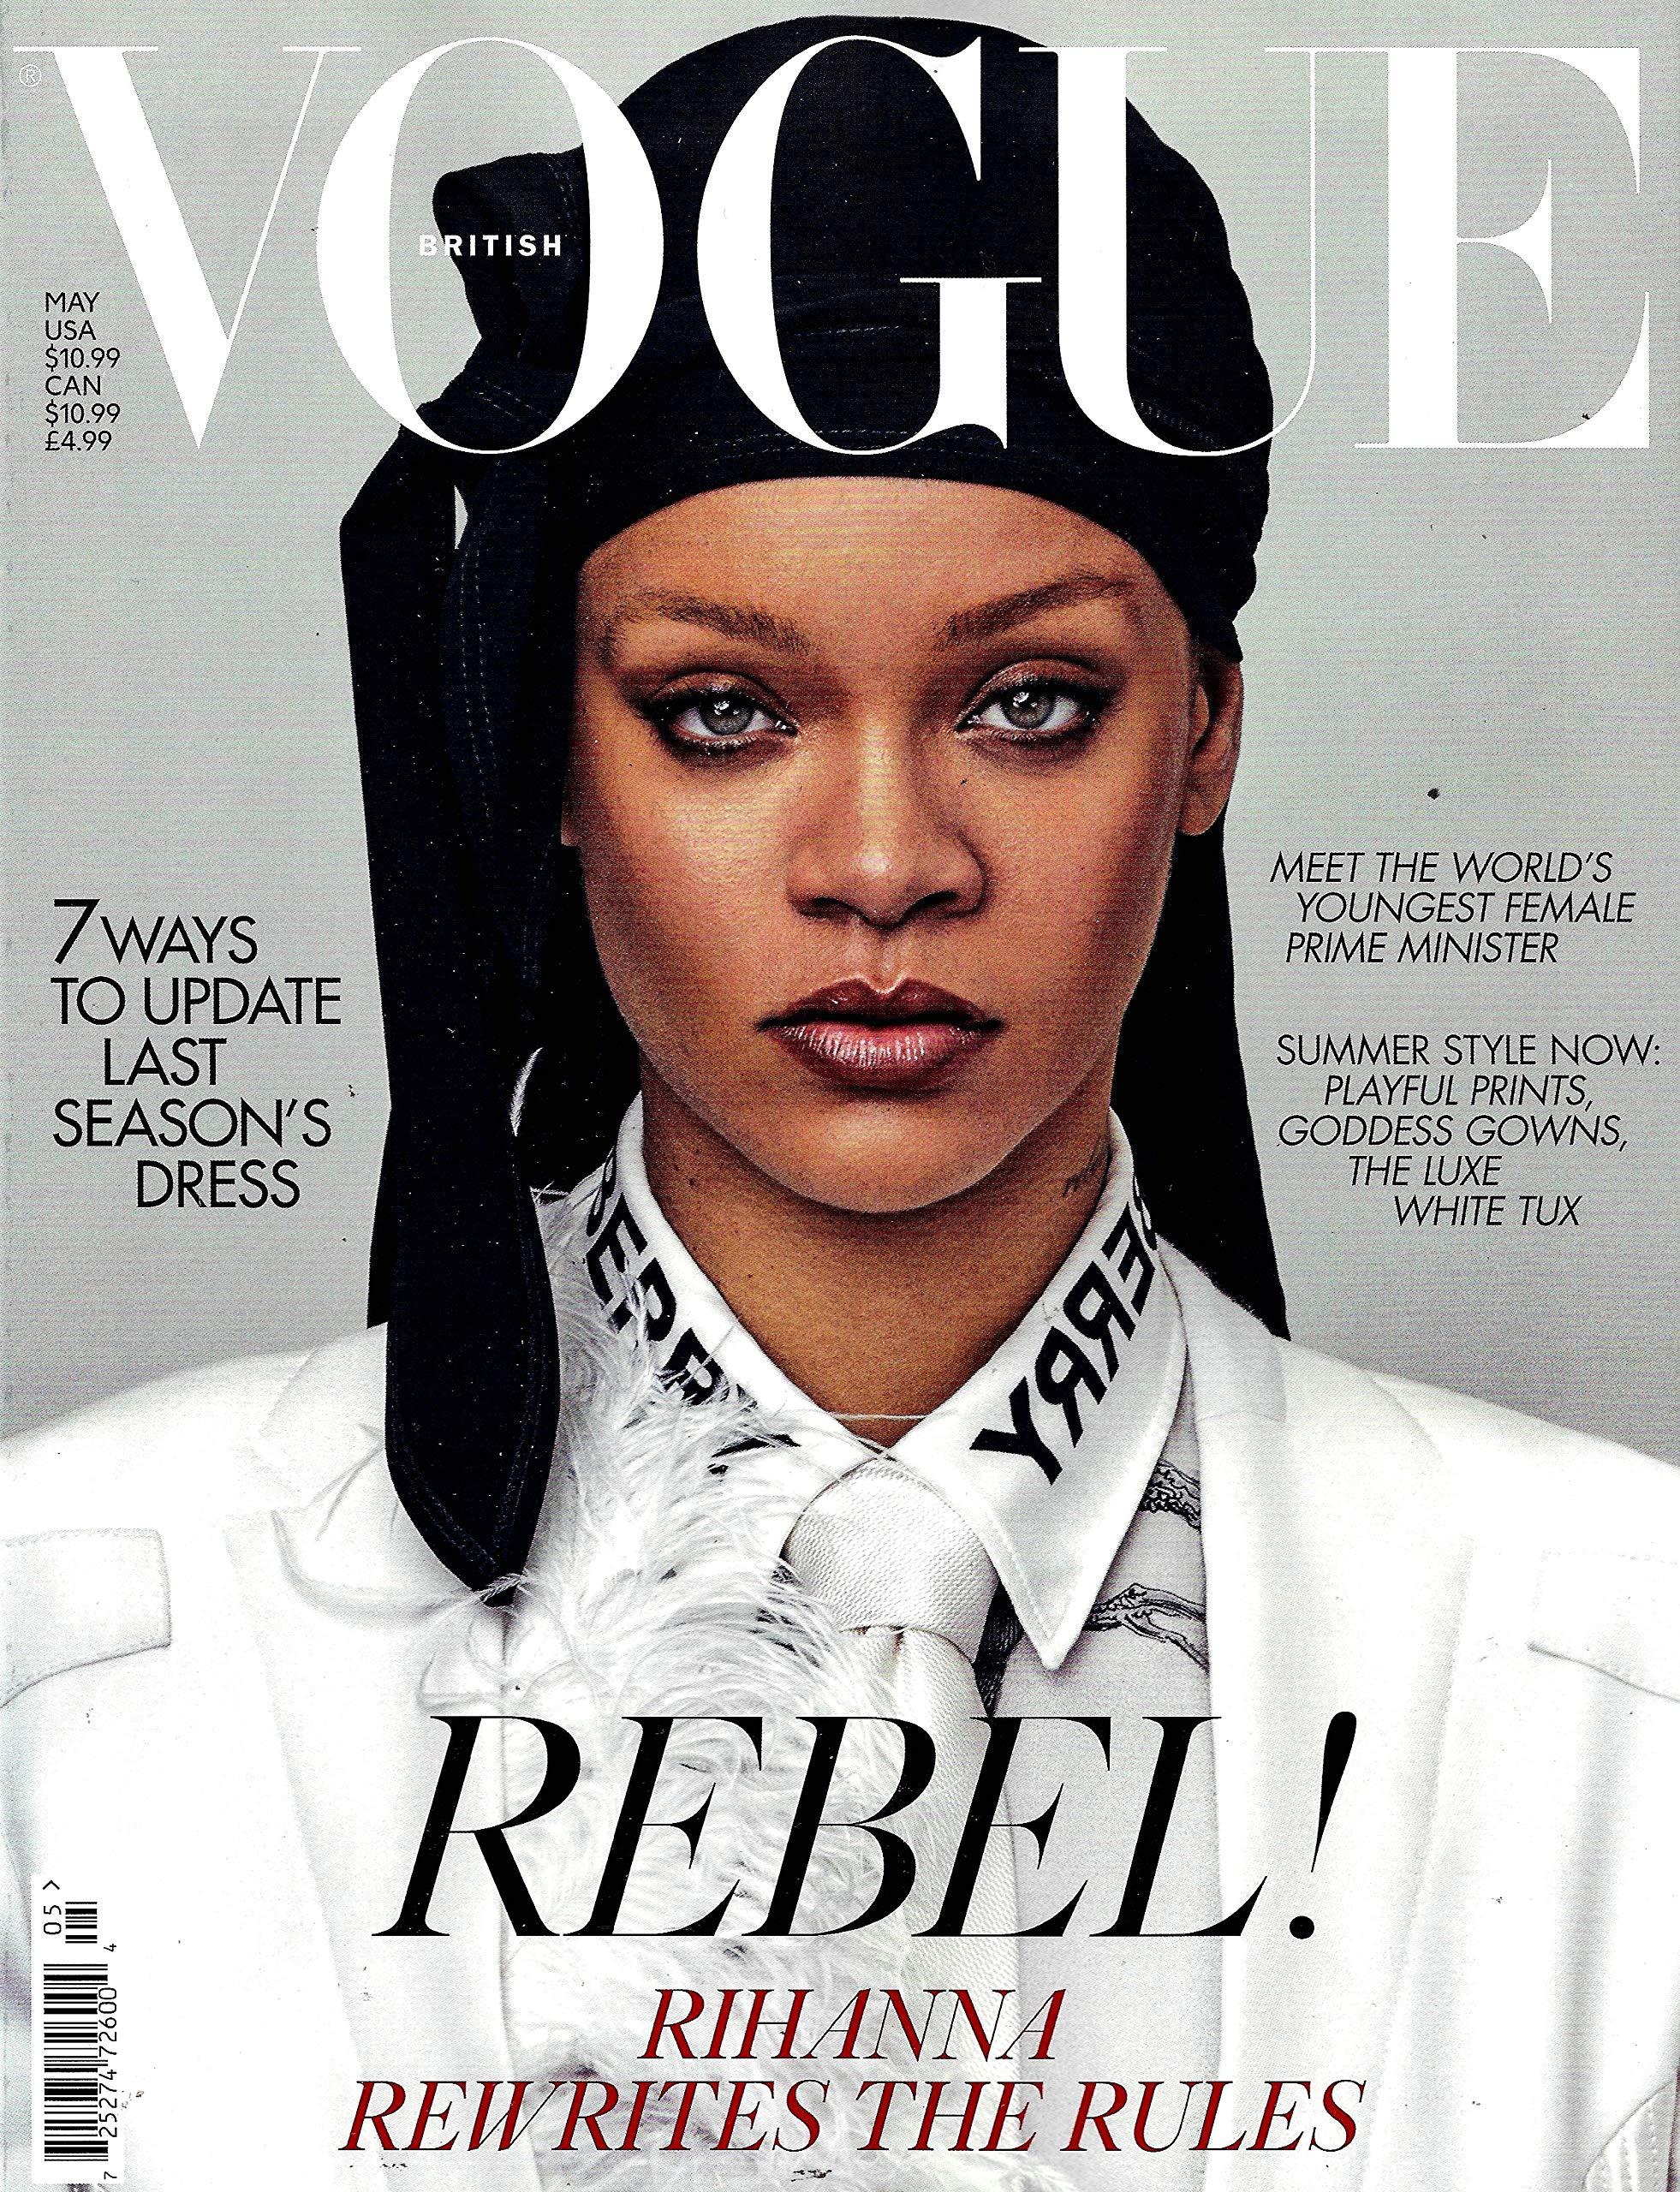 Vogue UK Magazine May, 12 Rihanna Cover BRITISH VOGUE UK ...